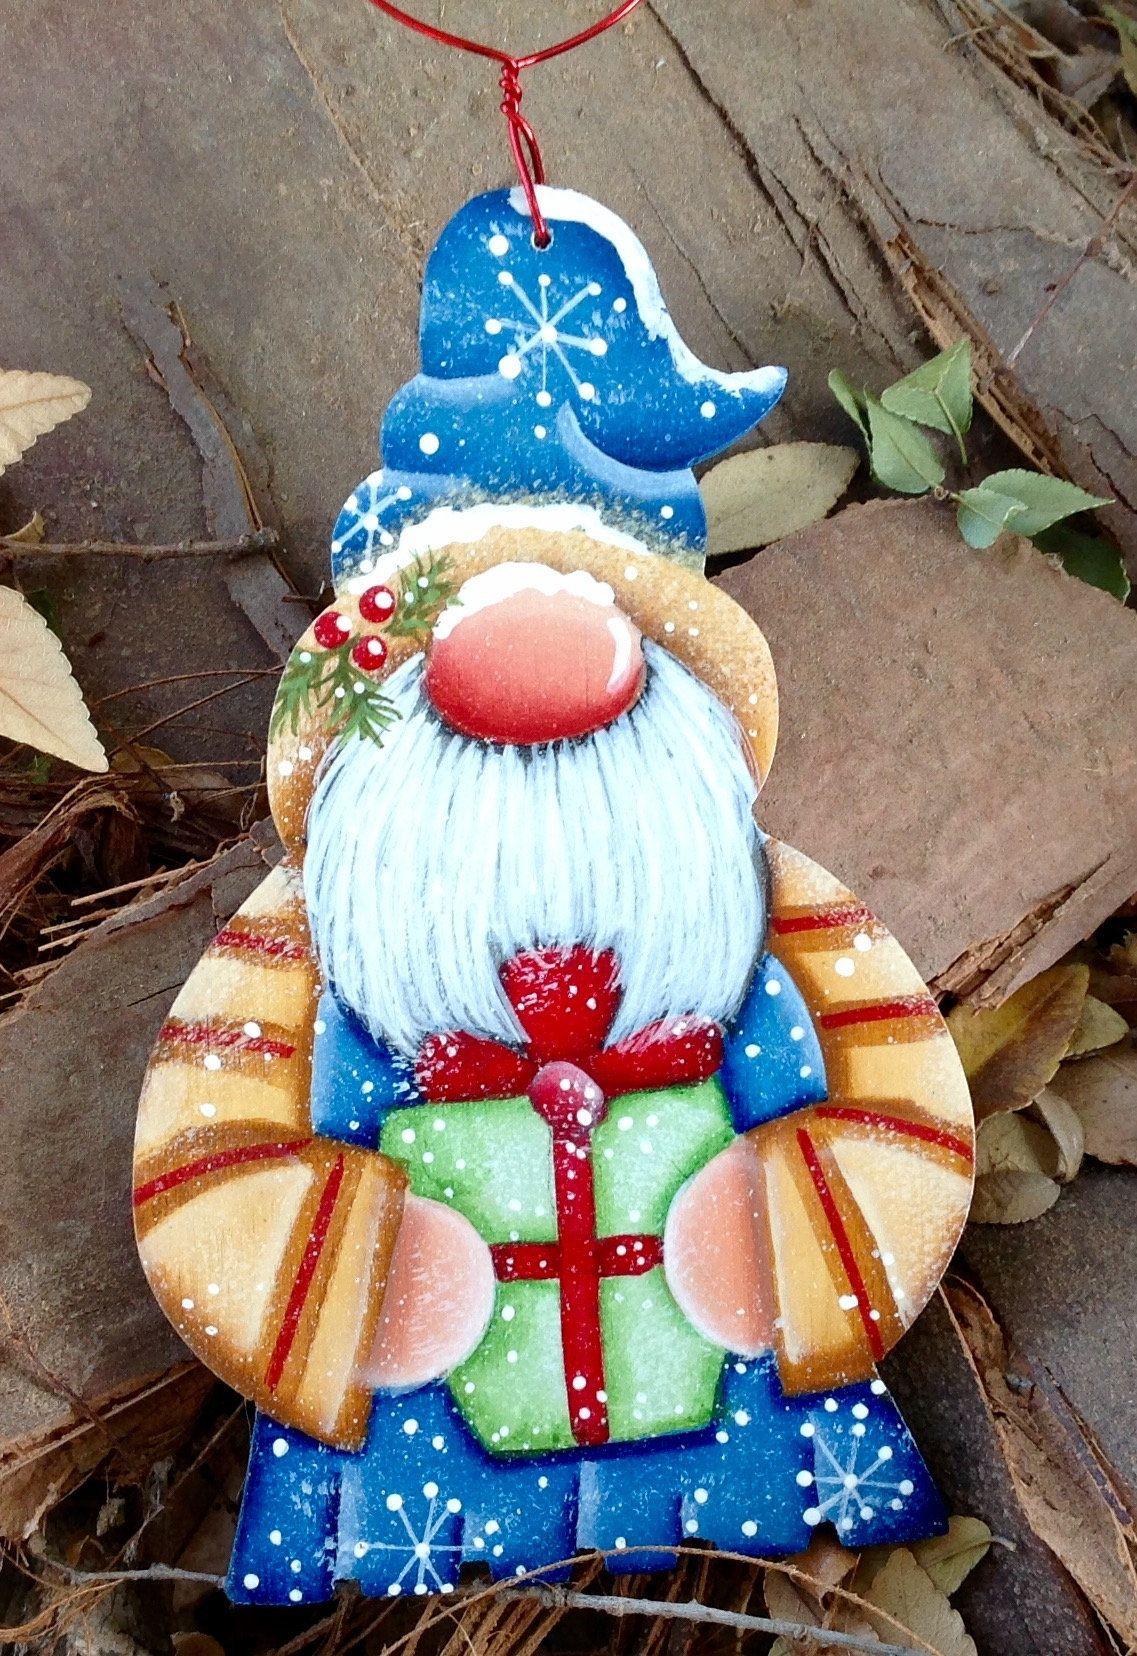 Christmas Gnome Ornament Painted Christmas Ornaments Christmas Gnome Christmas Paintings